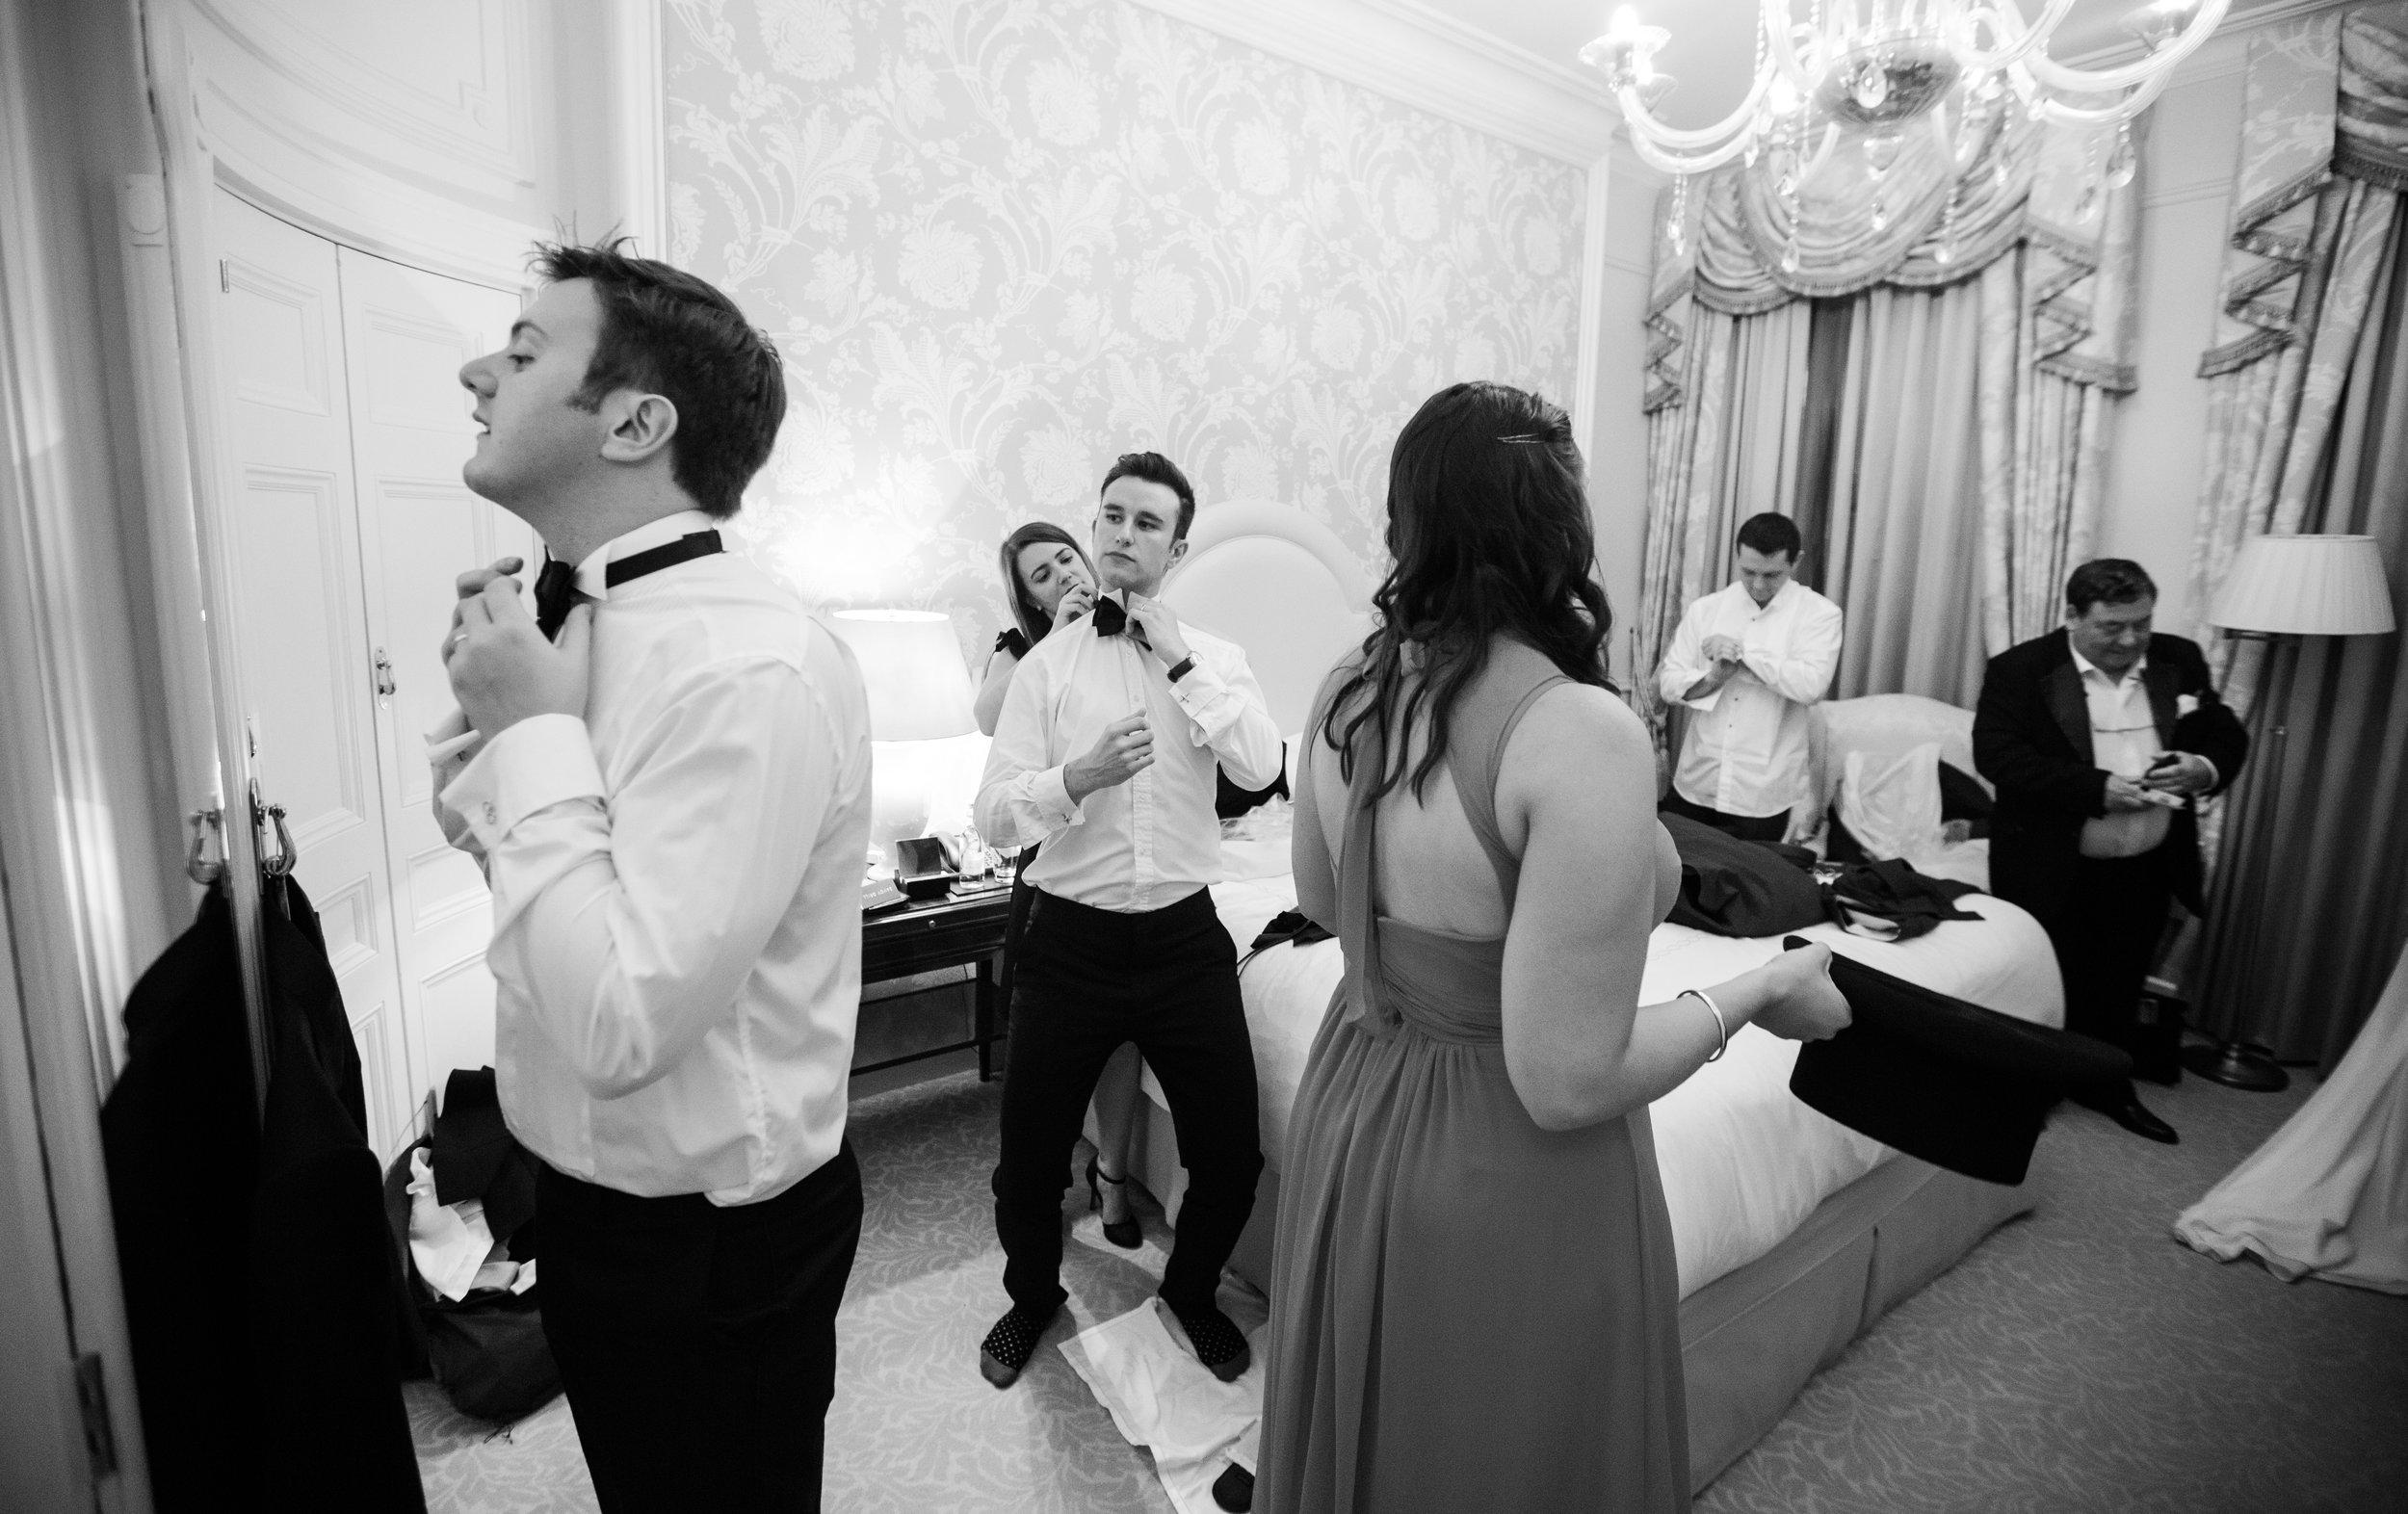 london-wedding-photography-wimbledon-wandsworth-town-hall-savoy-hotel-room-party-prep-chaos-91